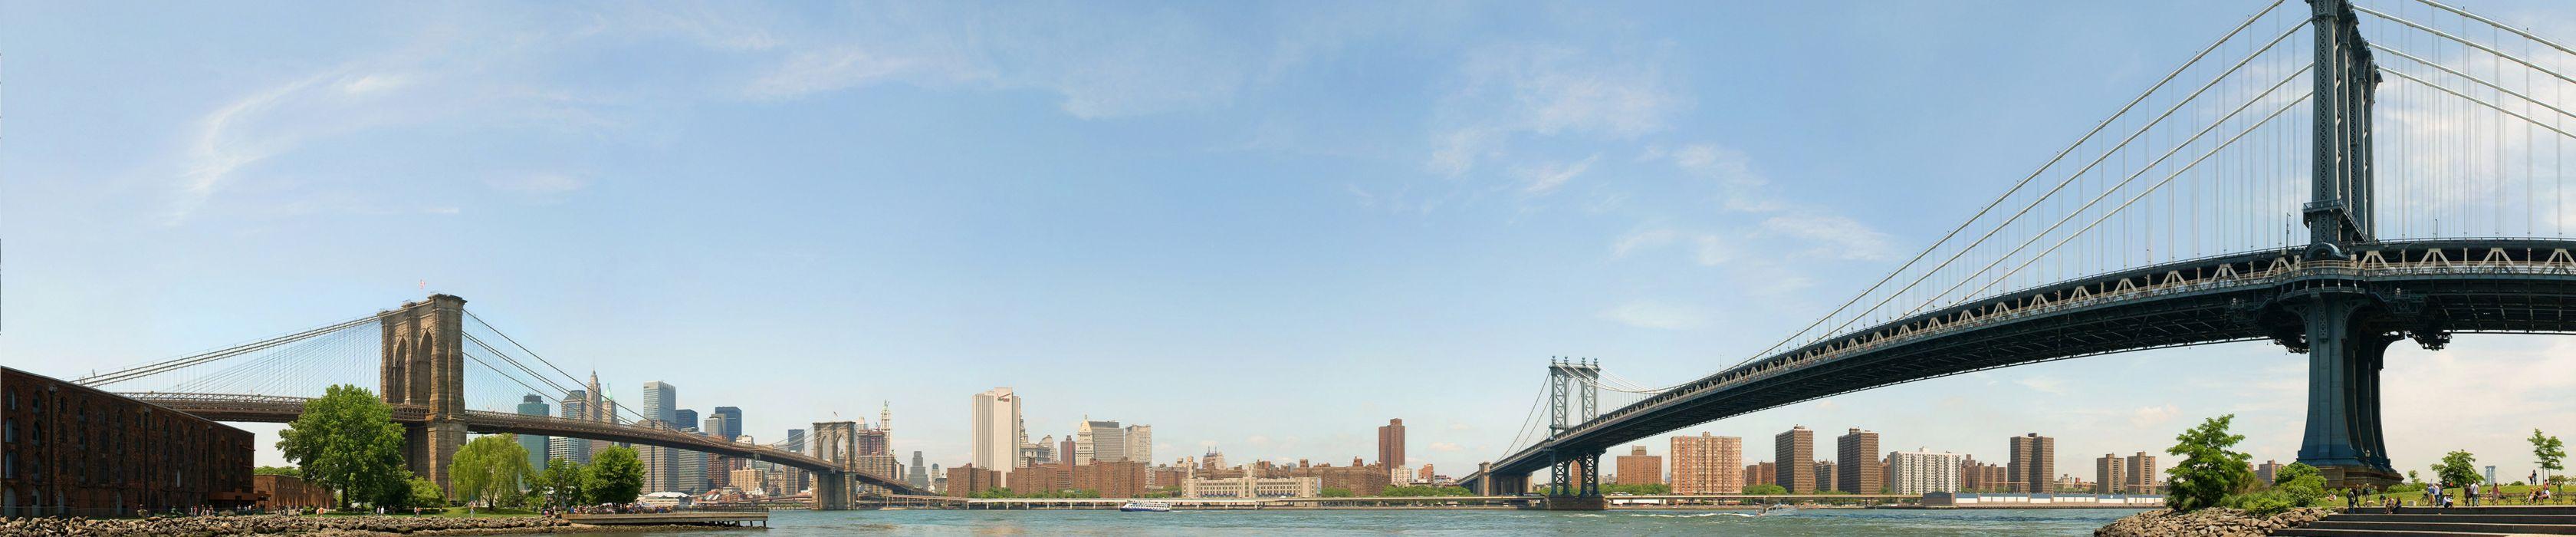 New York Brooklyn Bridge Manhattan wallpaper